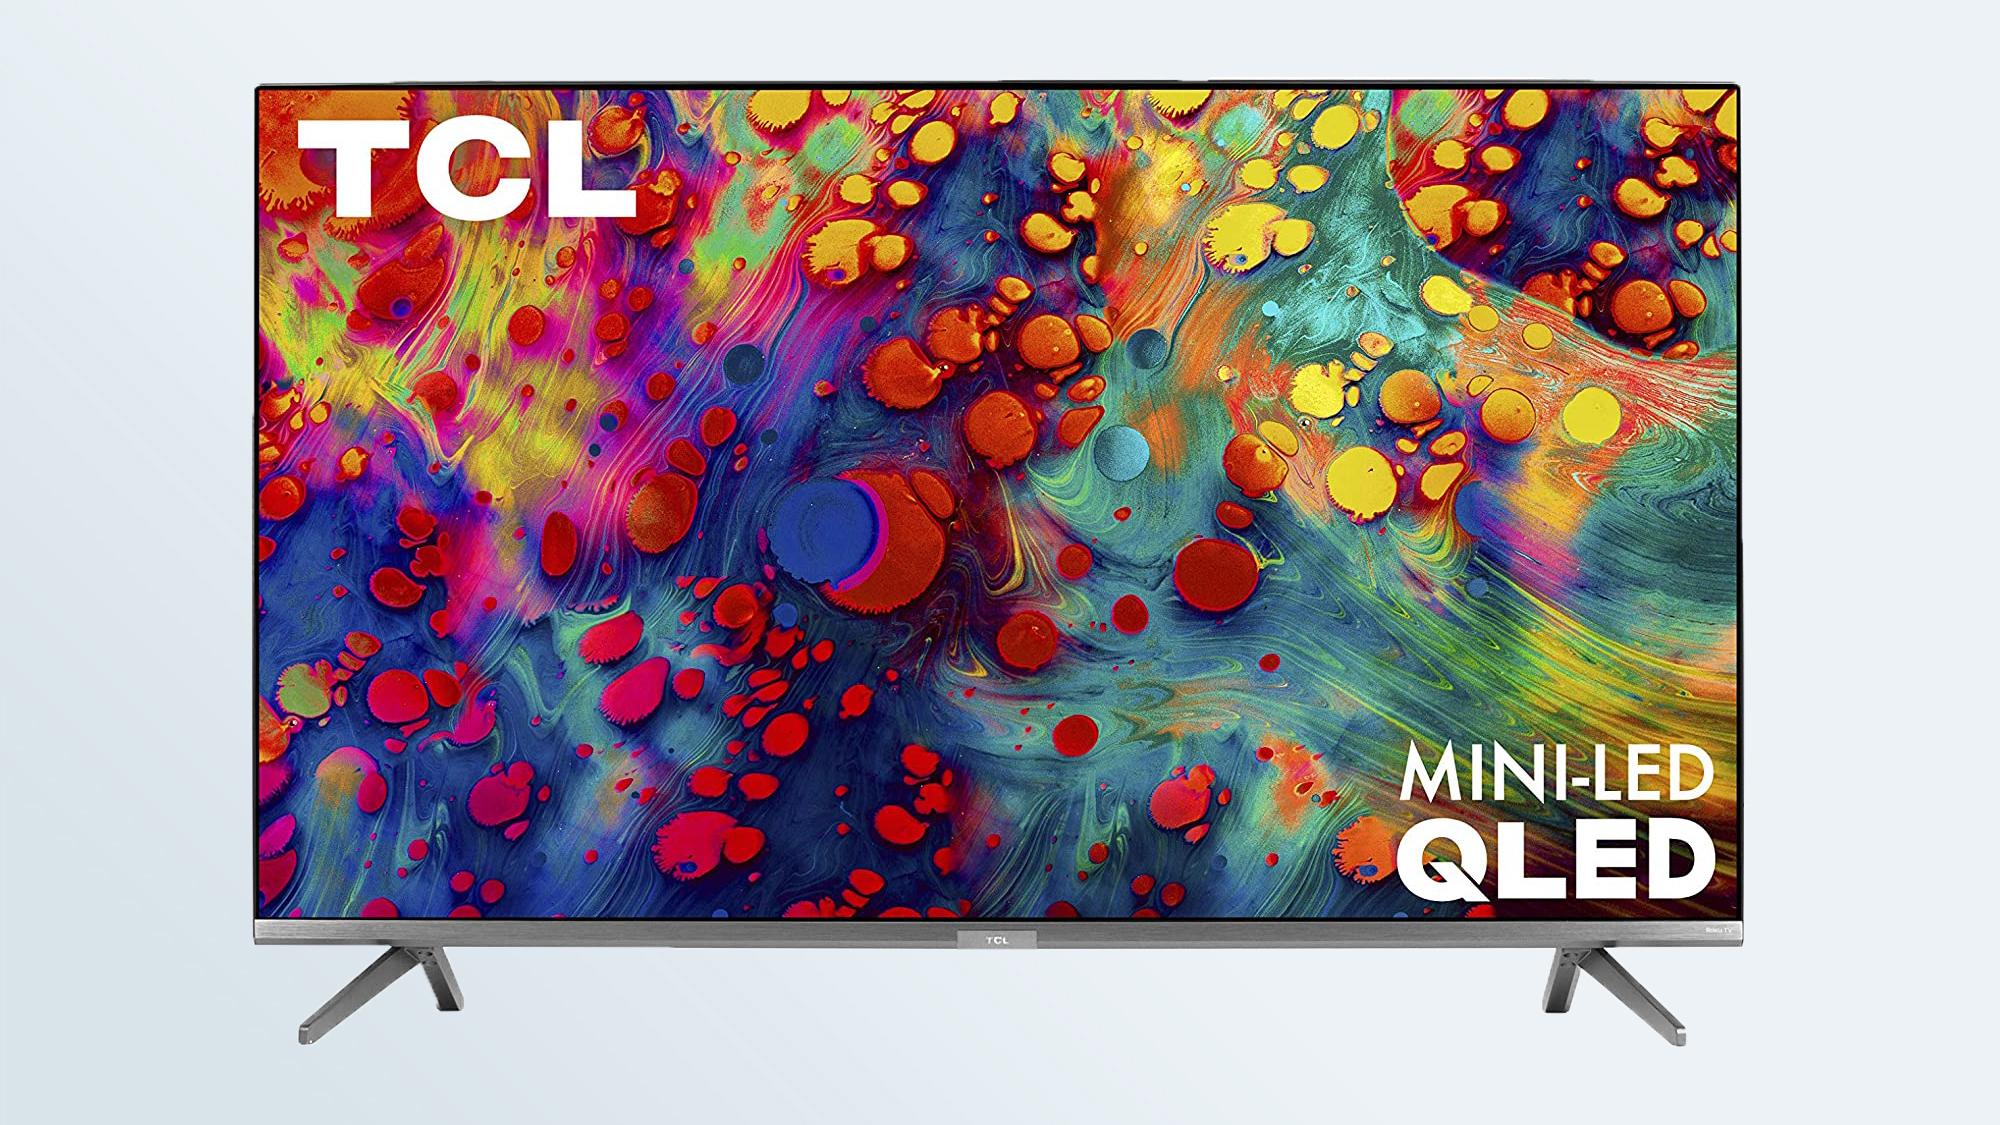 Best 65-inch TVs: TCL 6-Series Roku TV (R635)